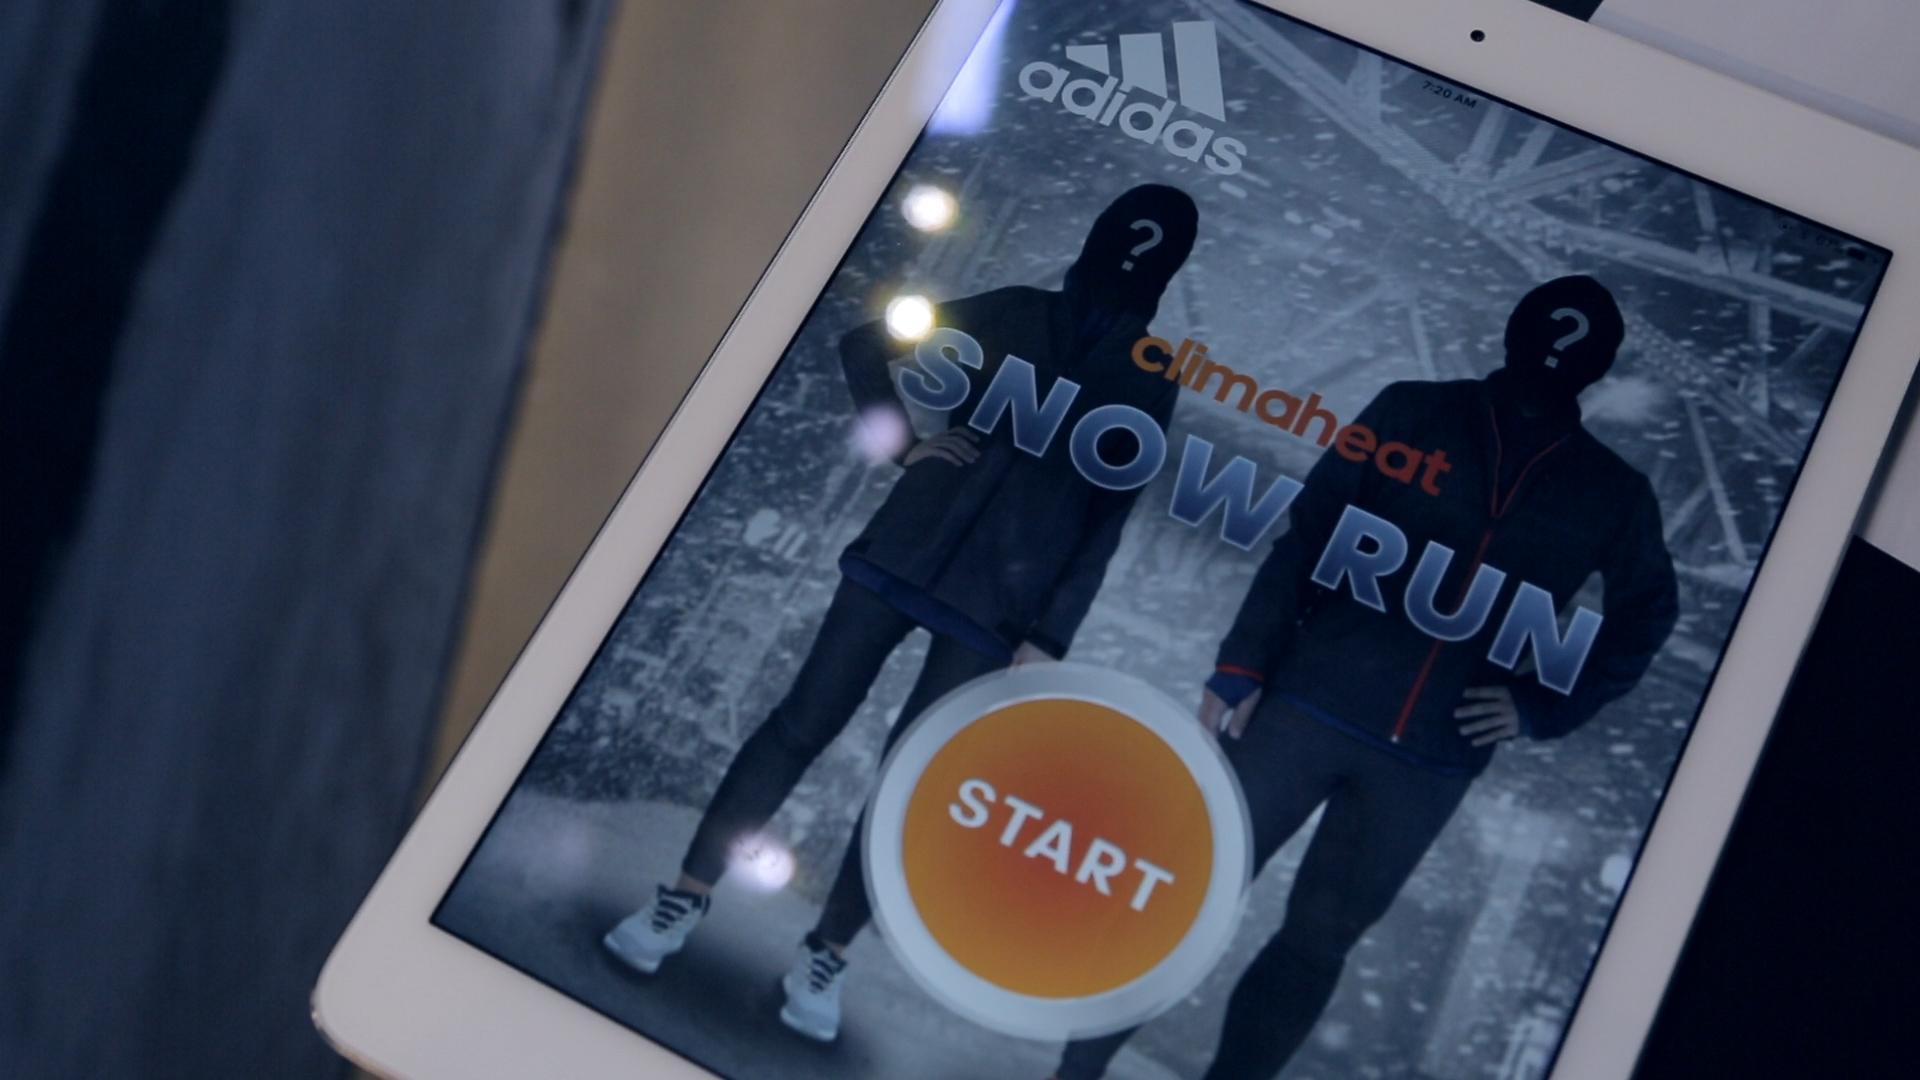 ADIDAS CLIMAHEAT VR SNOW RUN 7